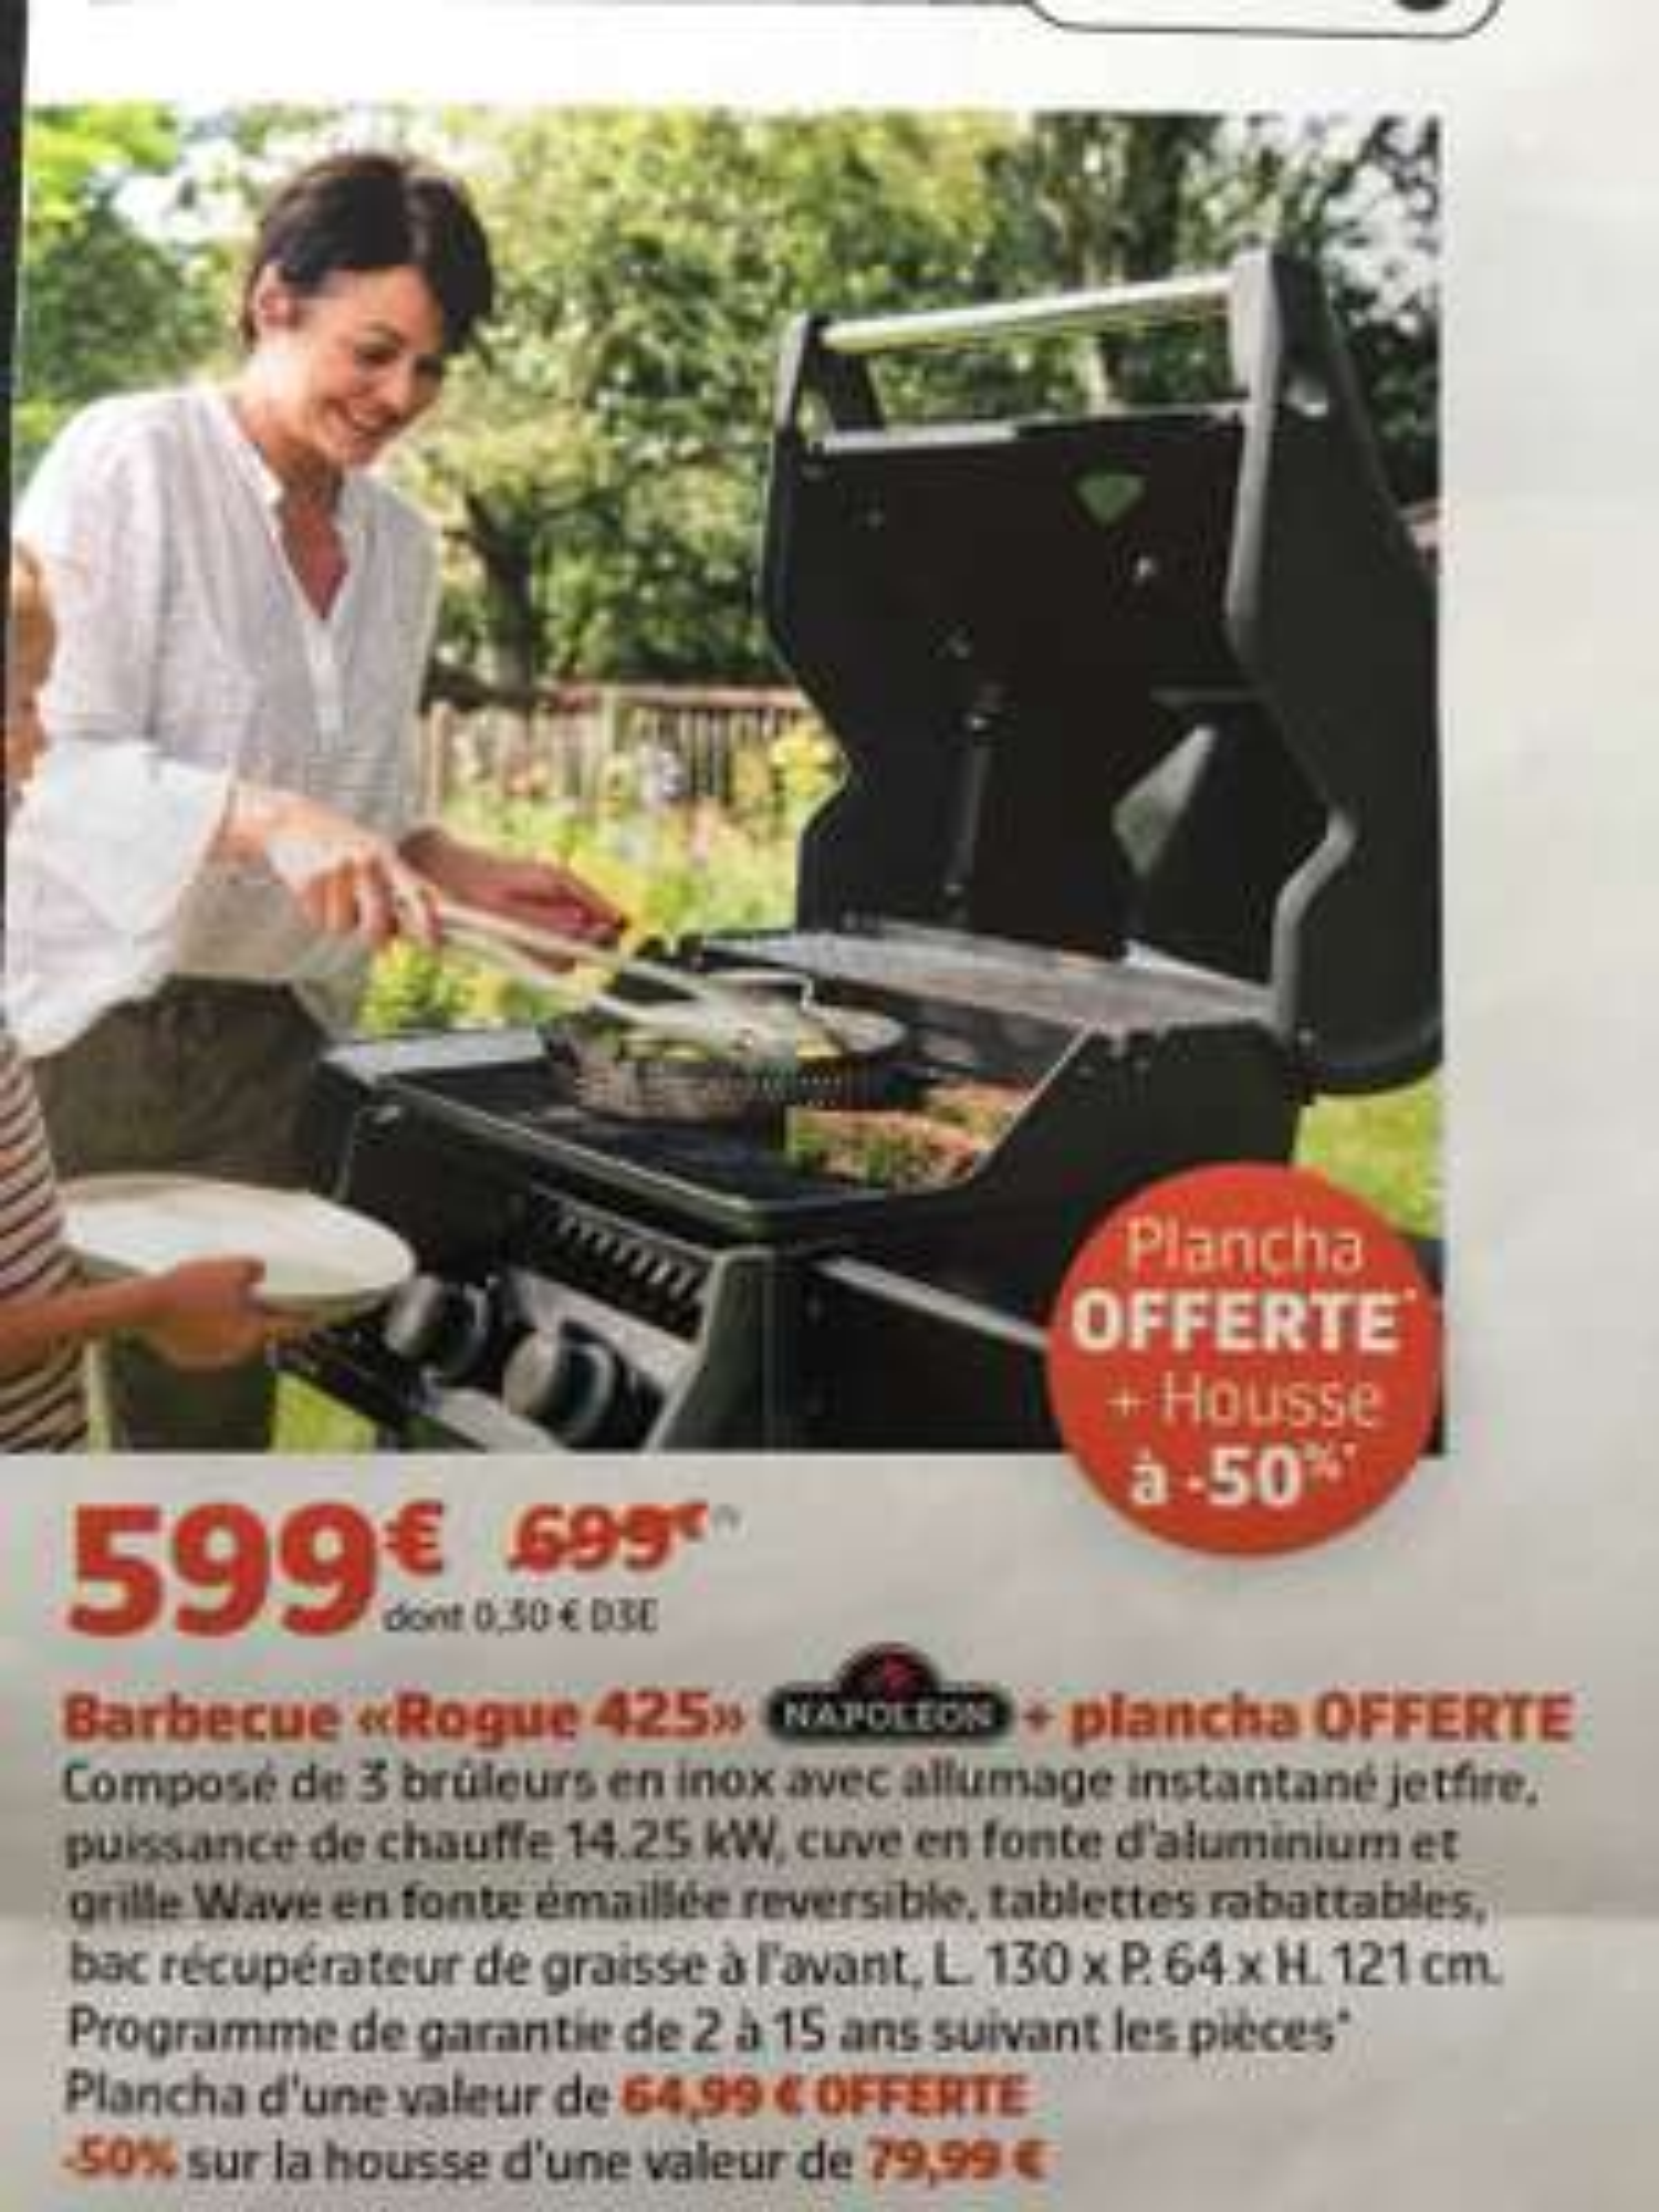 Barbecue Napoleon Rogue 425 + Plancha offerte + Housse